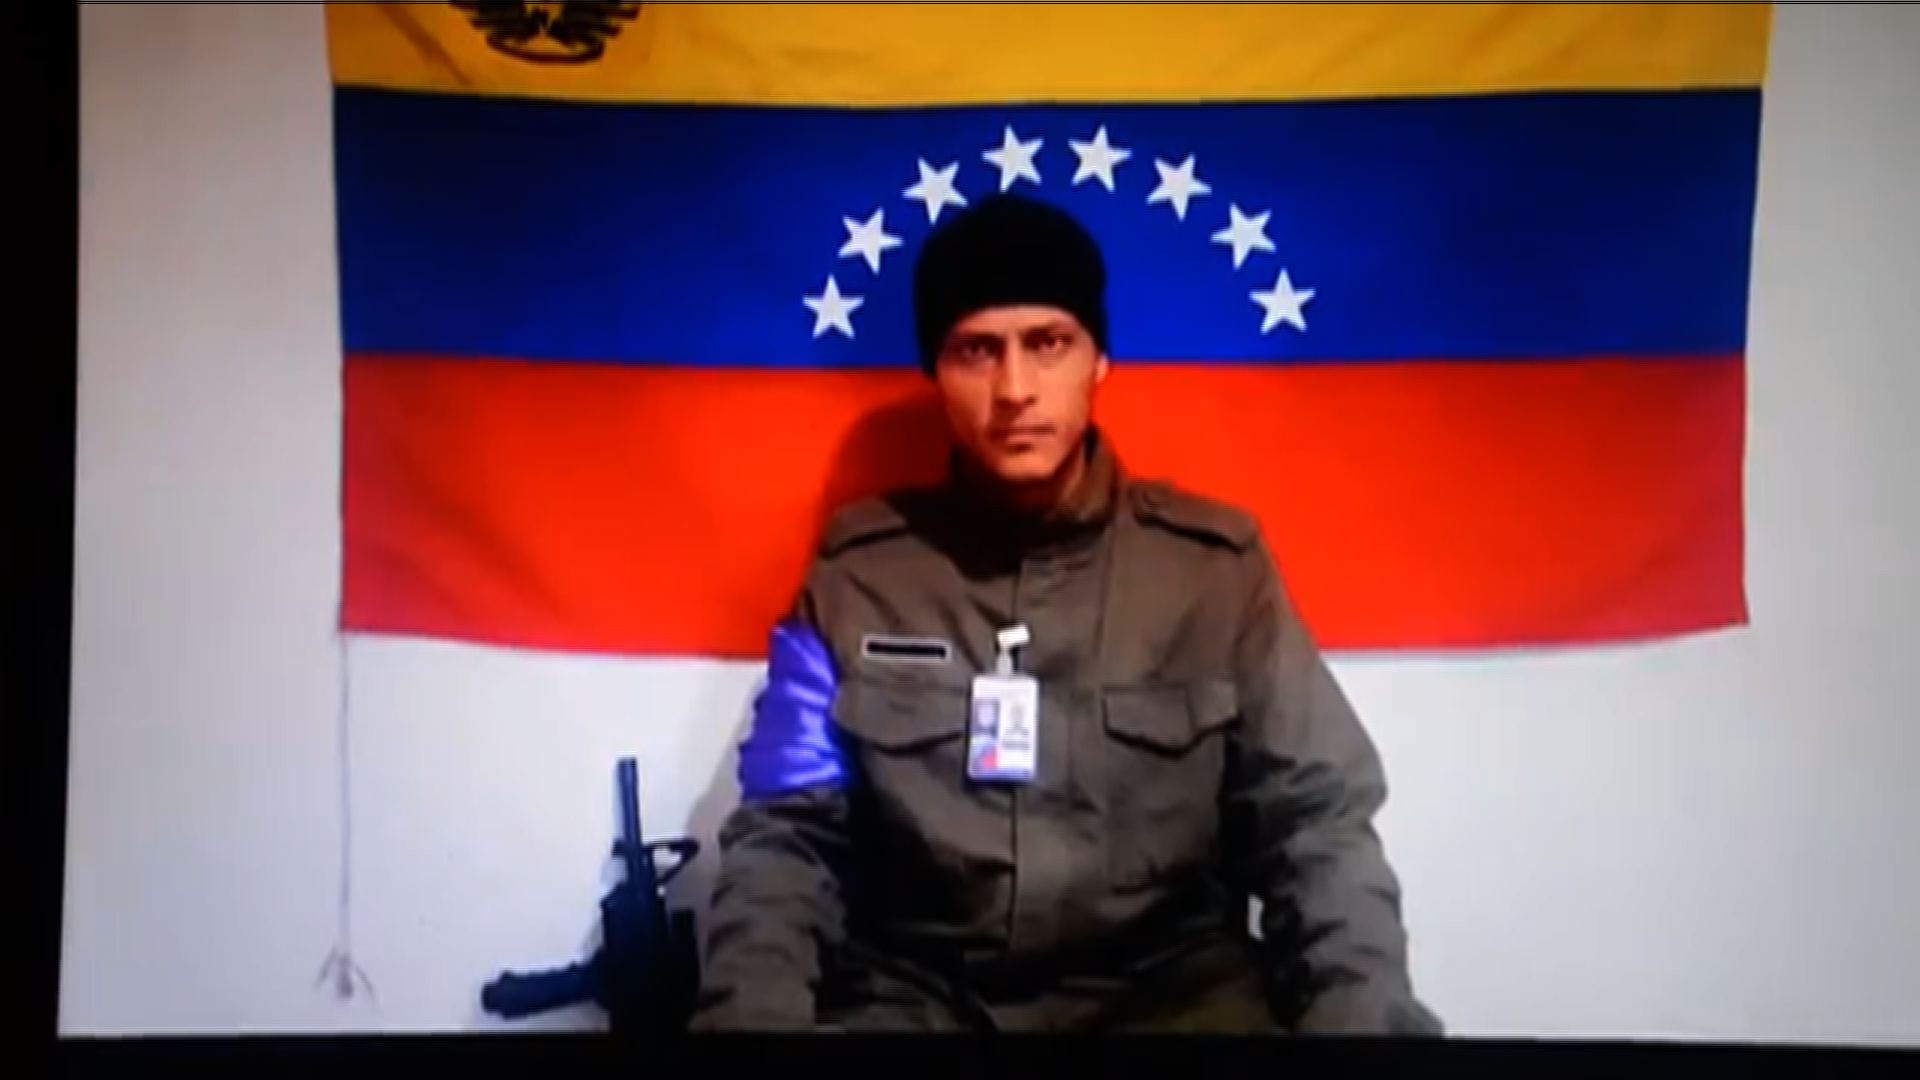 Gobierno venezolano confirma que mató a Óscar Pérez, el piloto que se rebeló contra Maduro